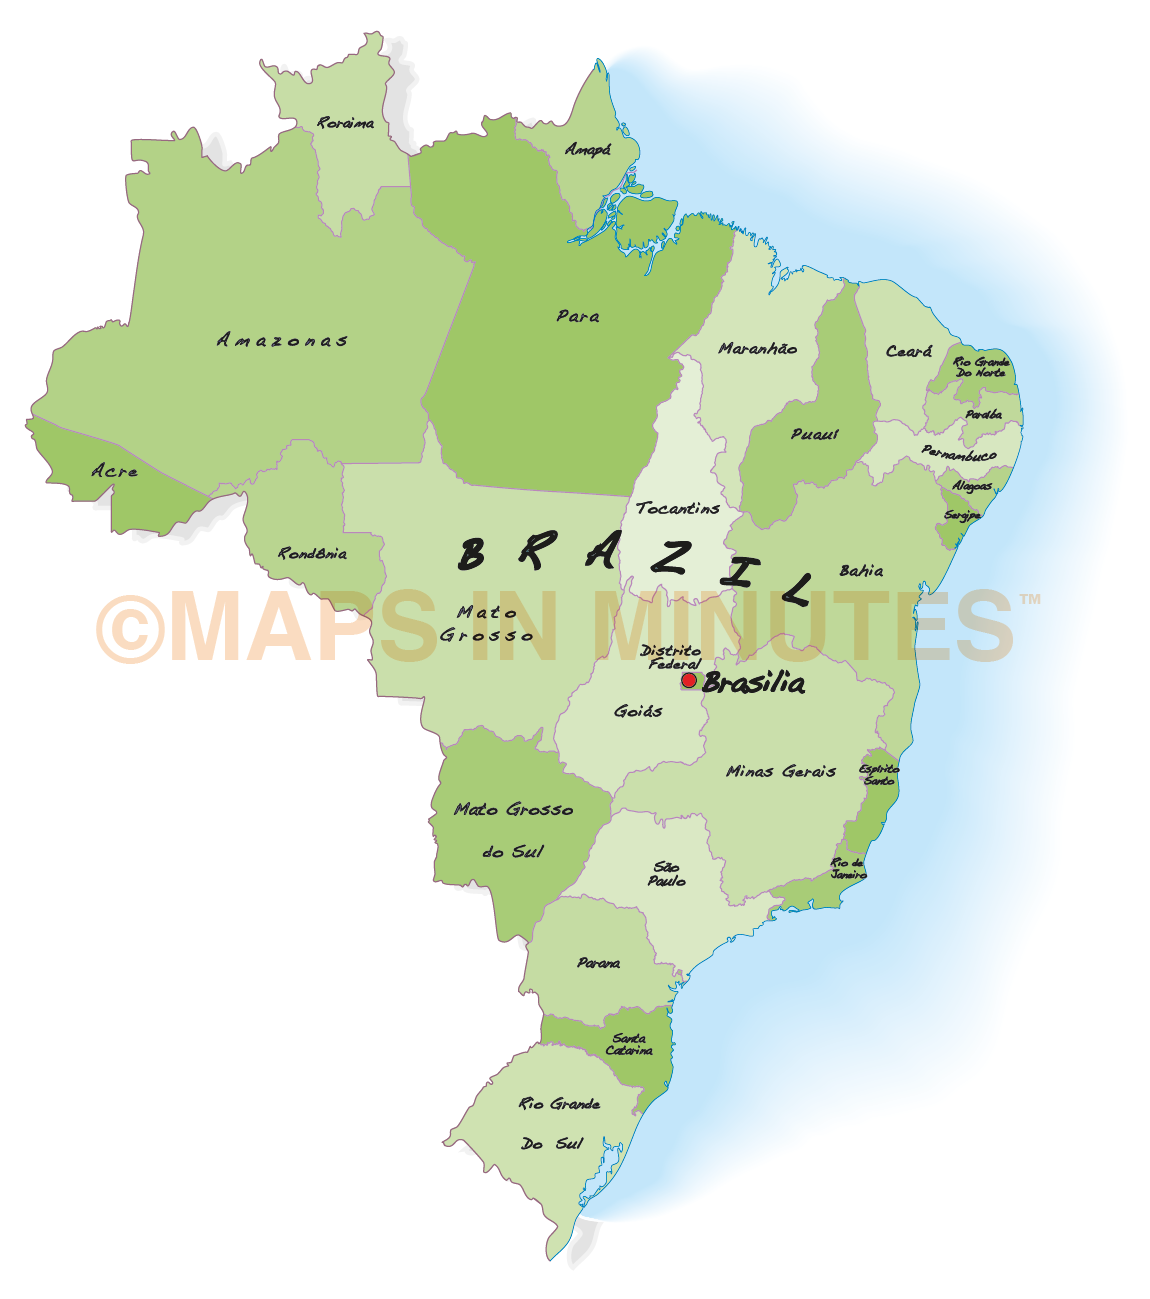 Vector Brazil Map Internal Divisions In Illustrator Format - Brazil map illustration